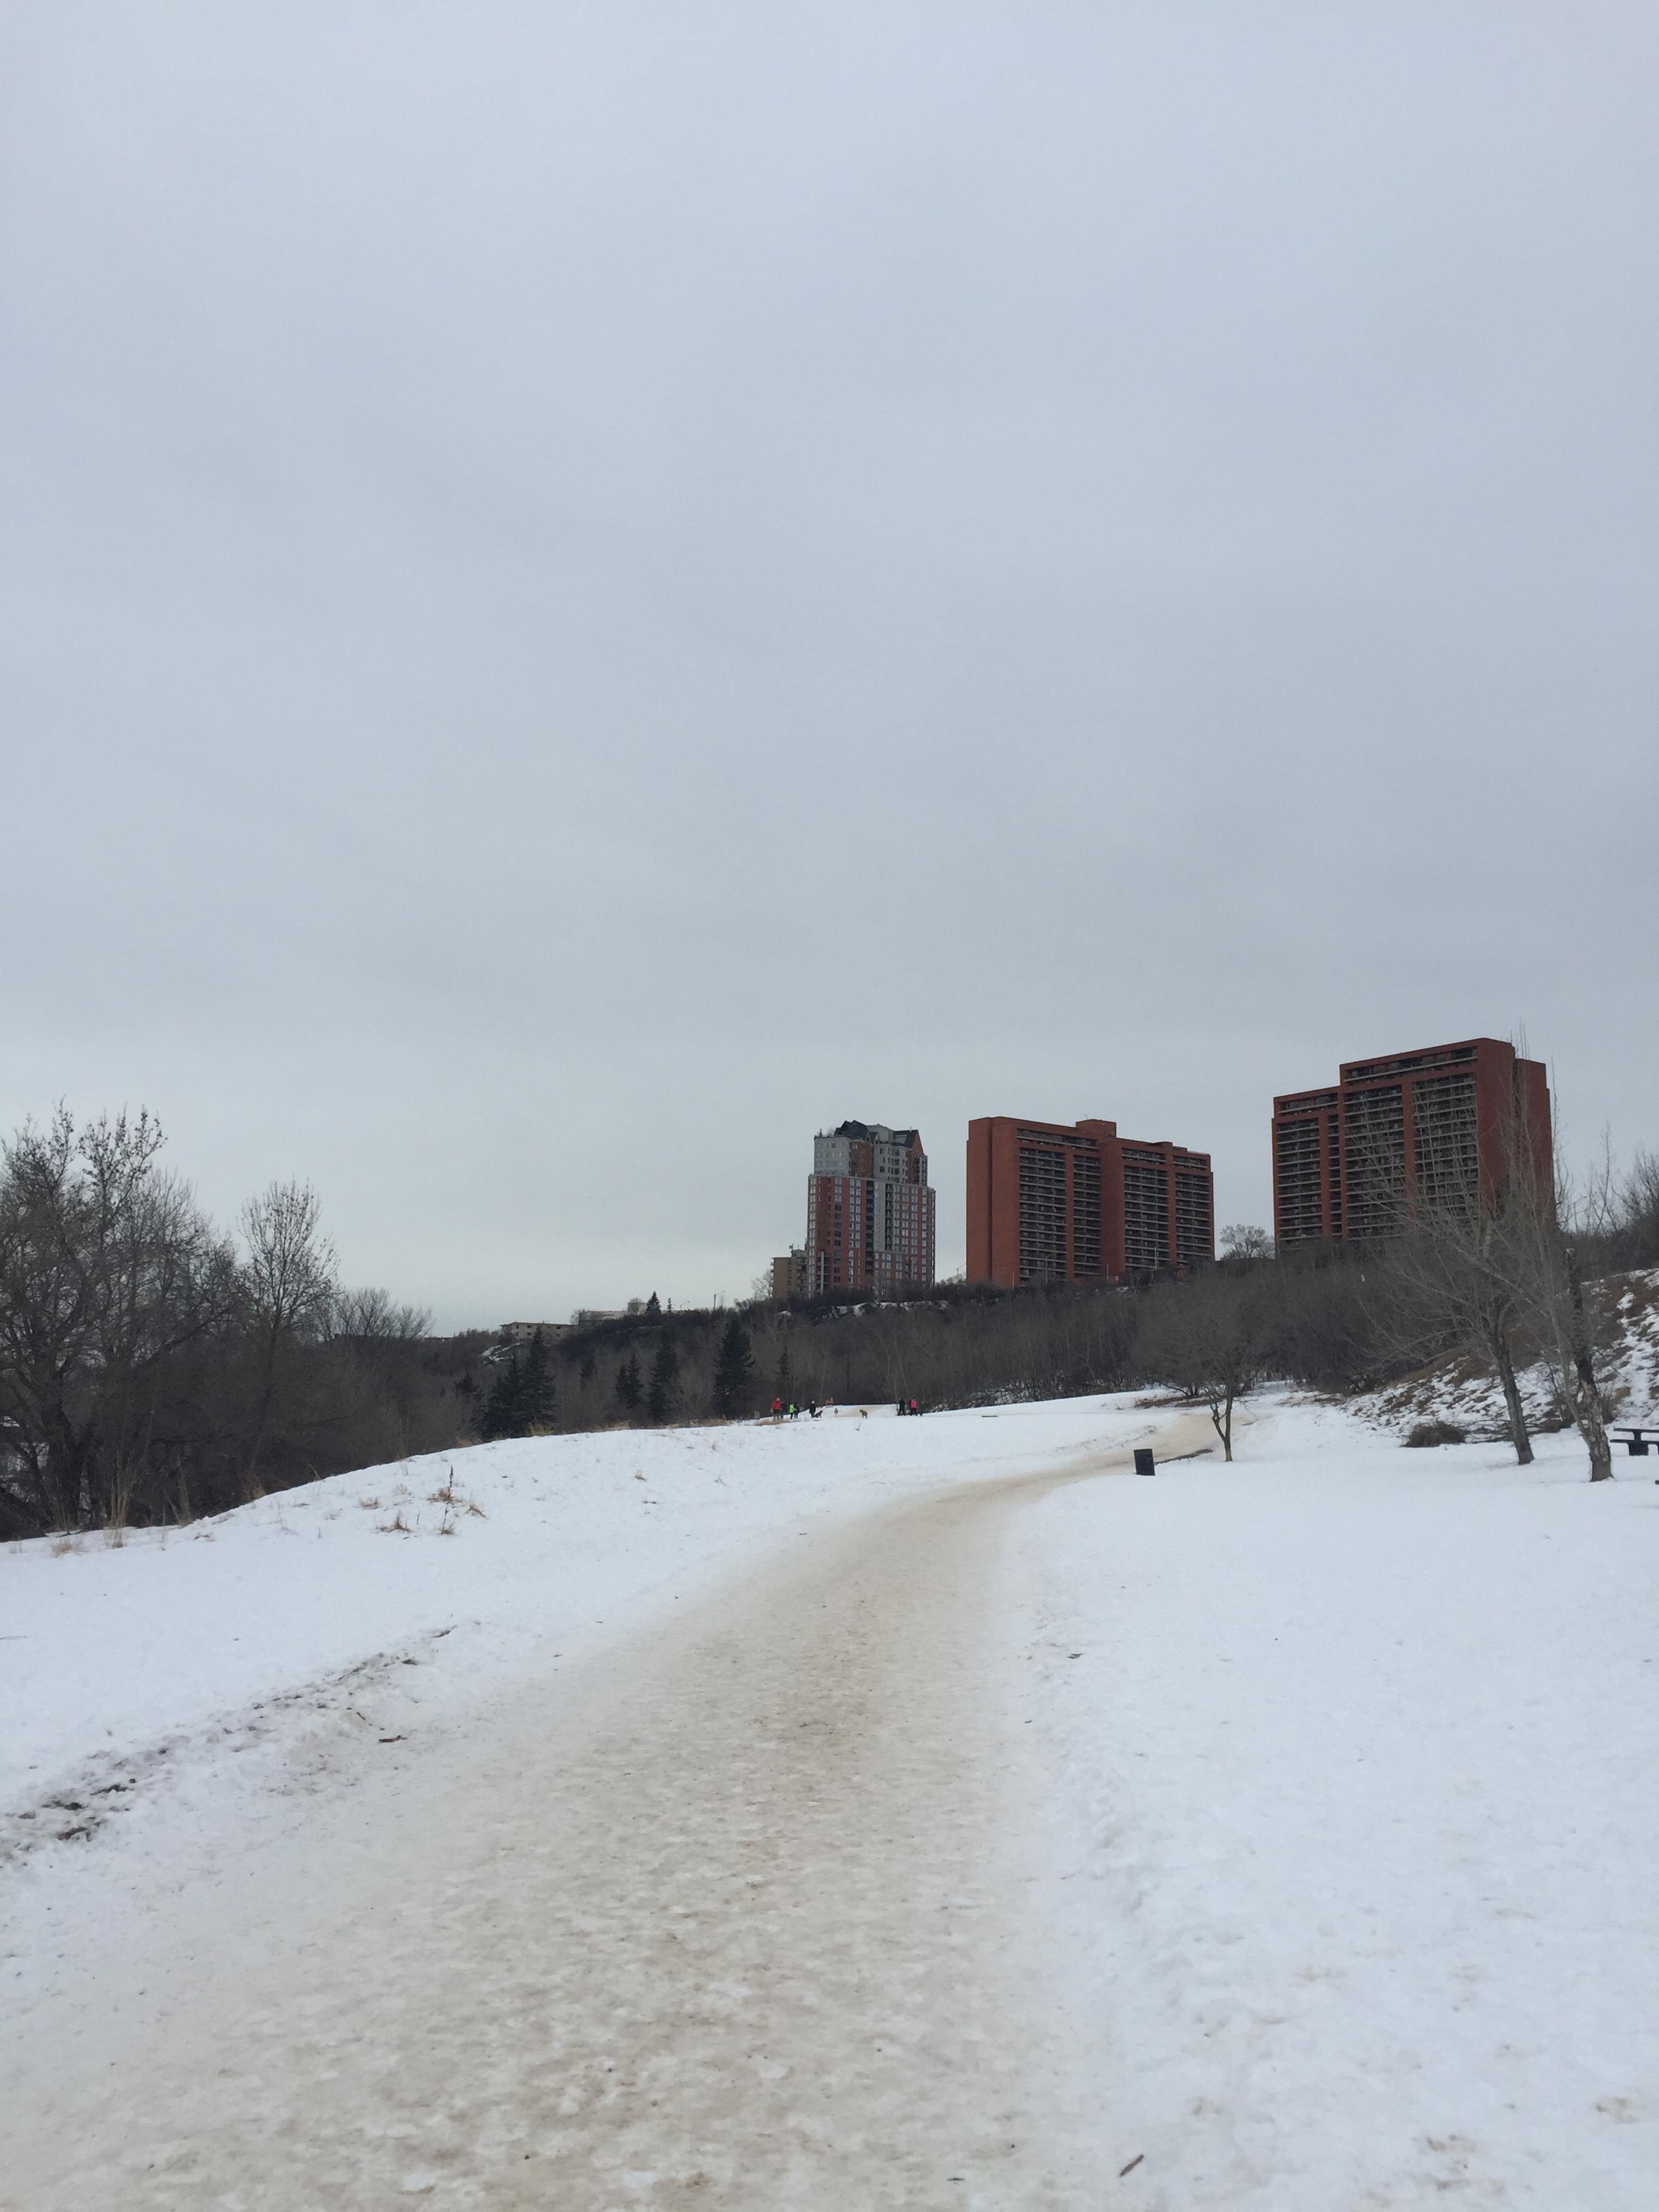 Edmonton: Edmonton Tourist: Dawson Park